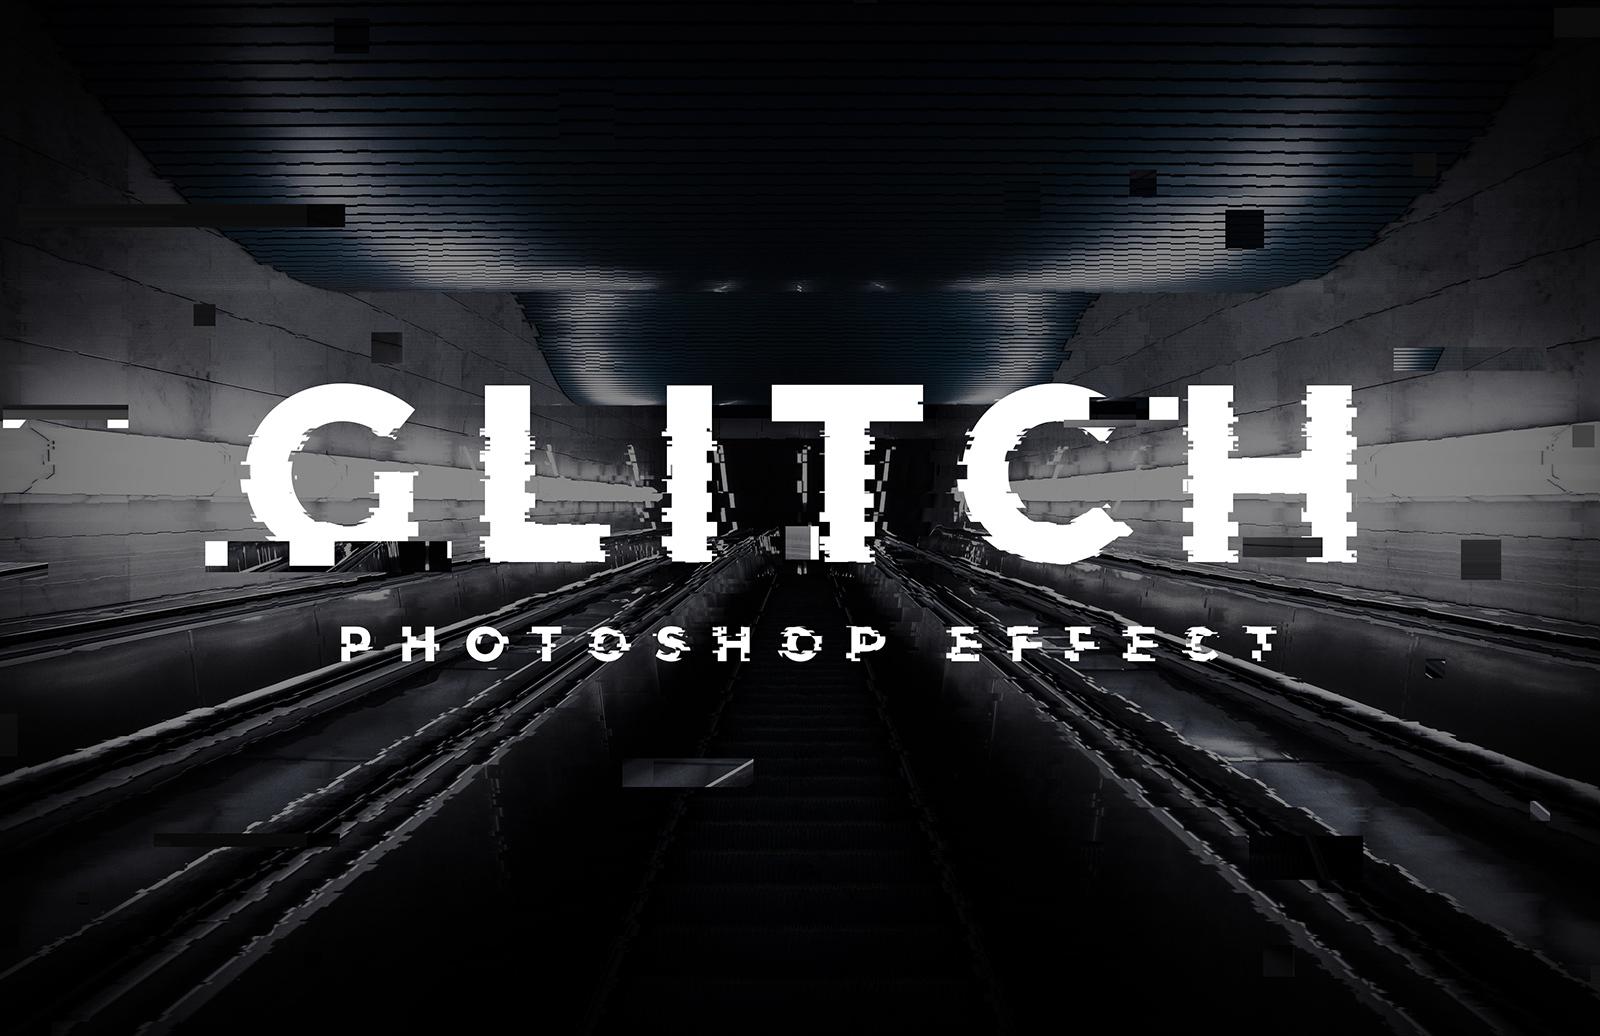 Glitch Image Effect Generator V2